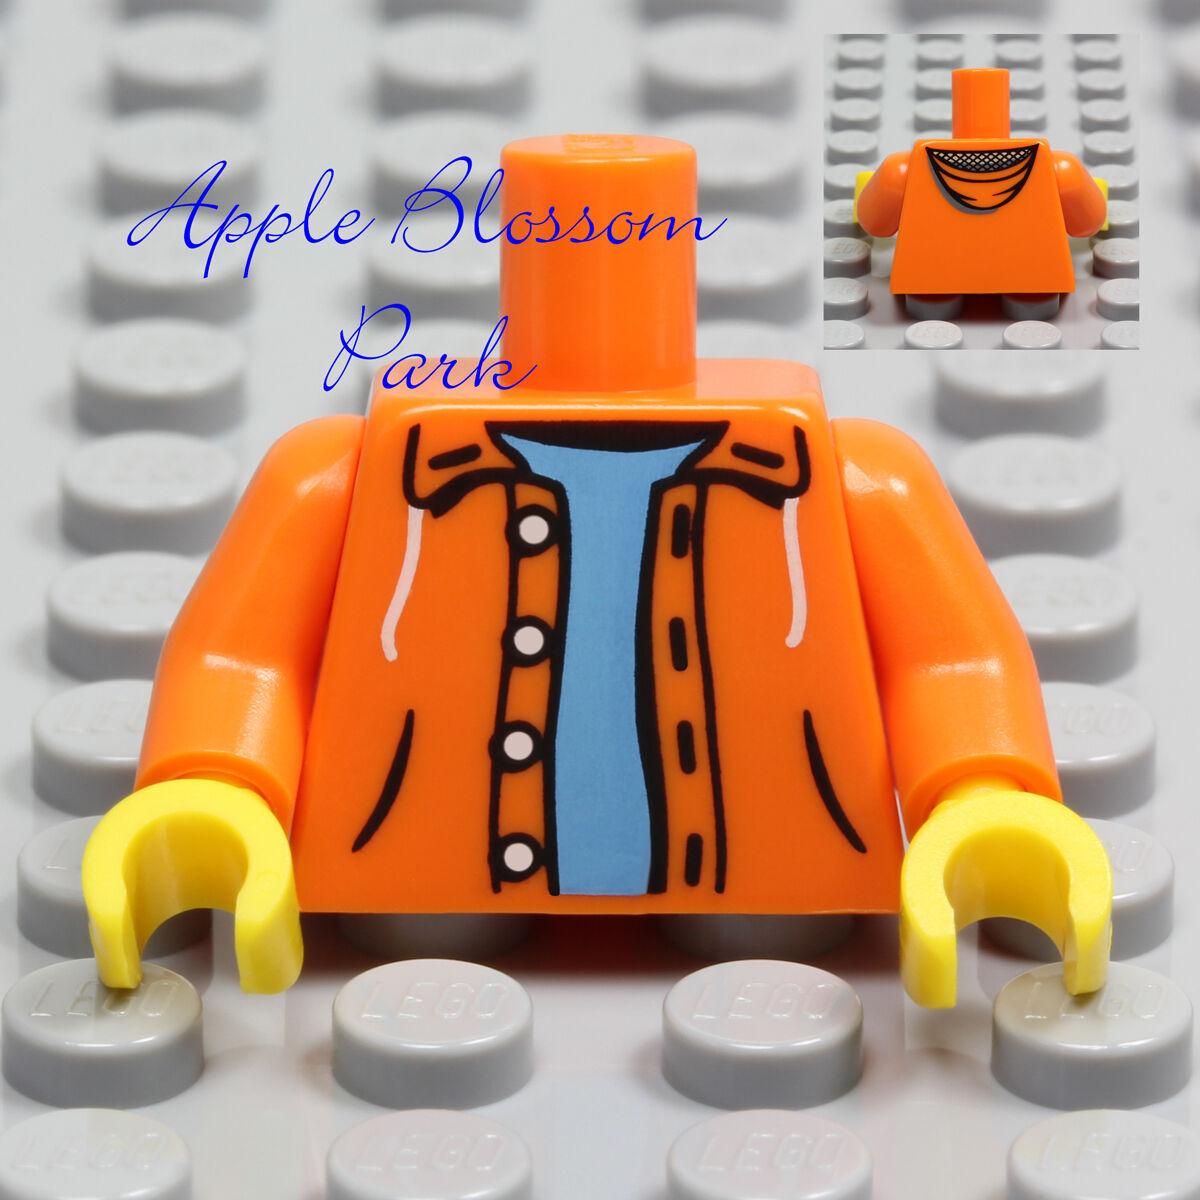 LEGO City White and Medium Blue Minifigure Hoodie Sweatshirt Torso